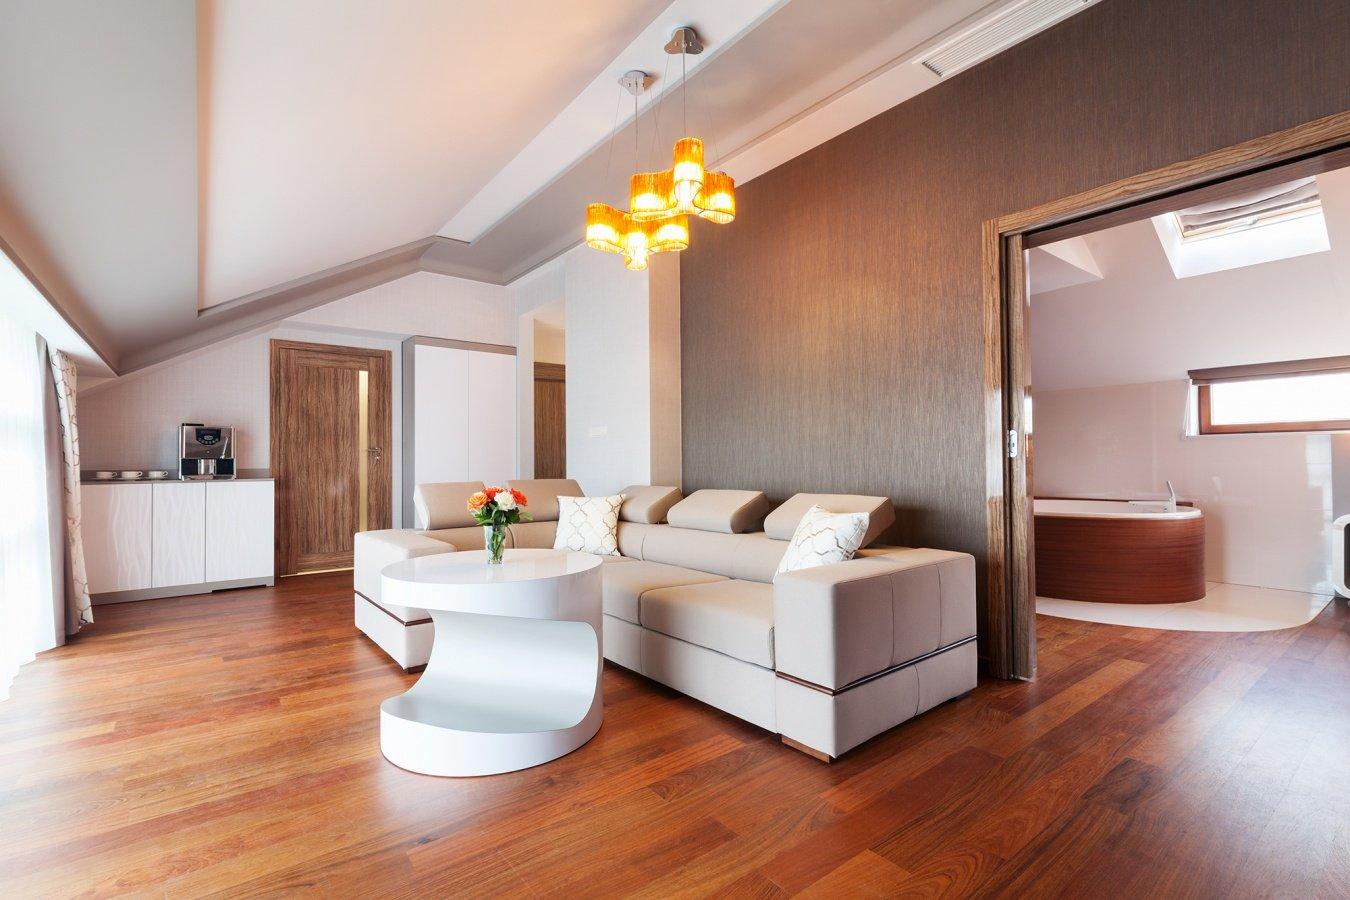 Metropolis design hotel sp z o o ska krak w for Design hotel krakow